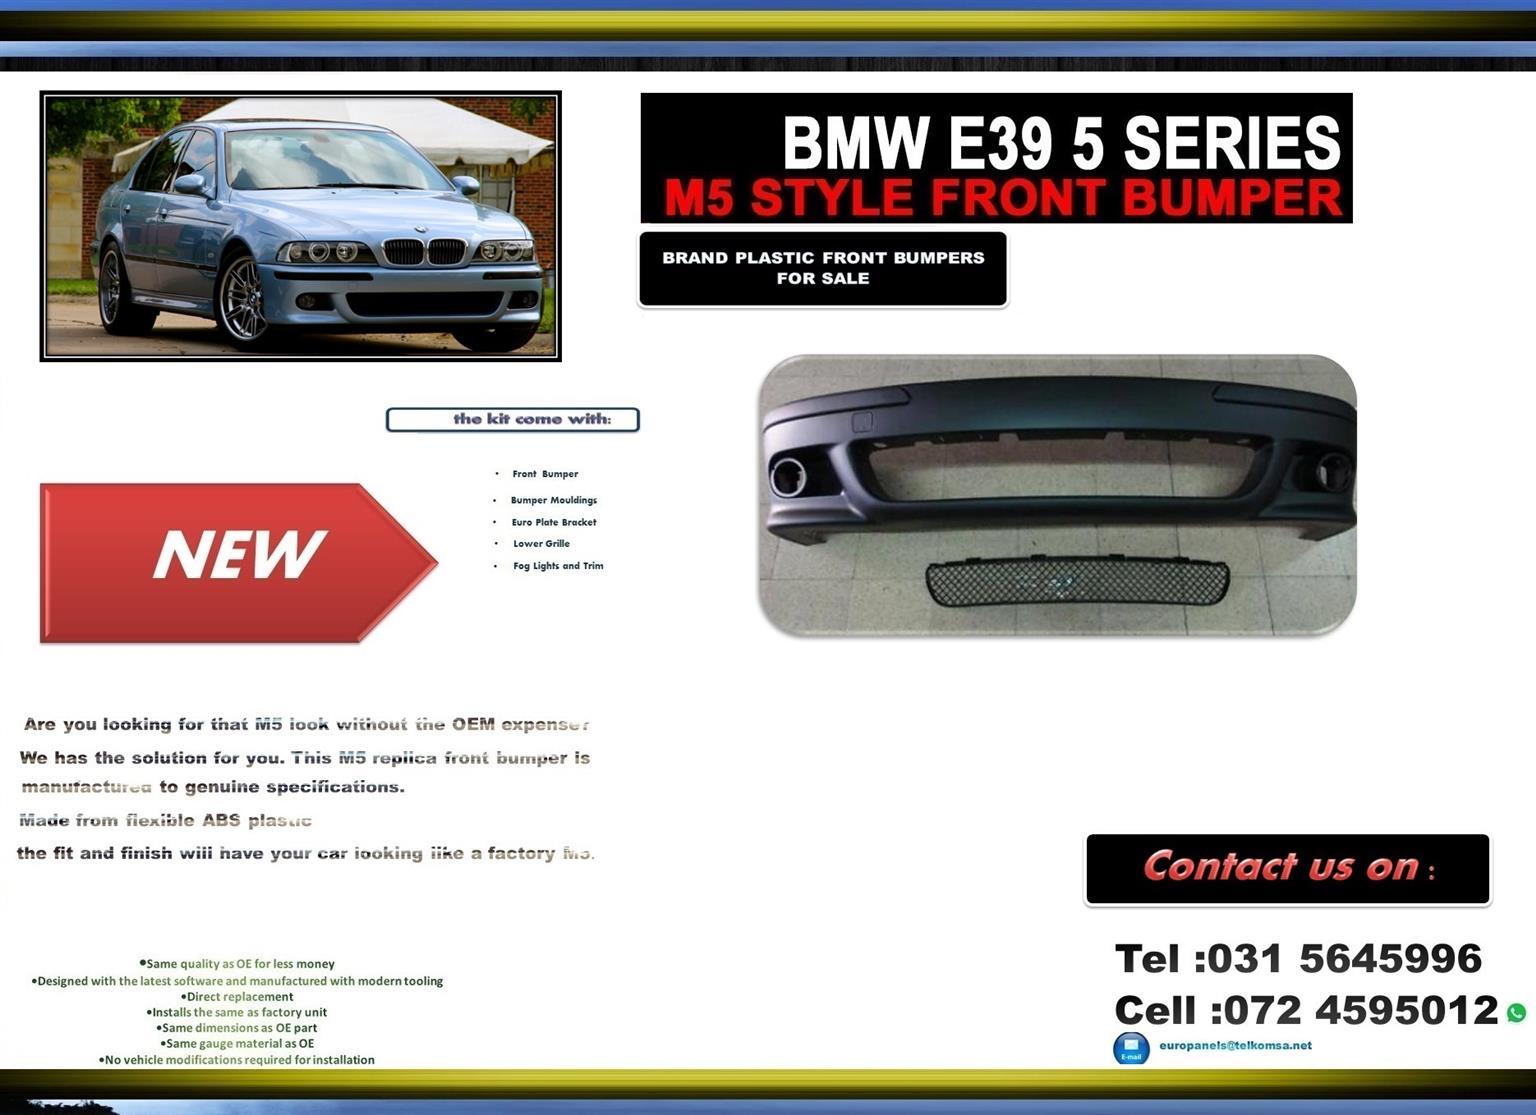 Bmw E39 5 Series M5 Brand New Plastic Front Bumper Price R2300 Junk Mail